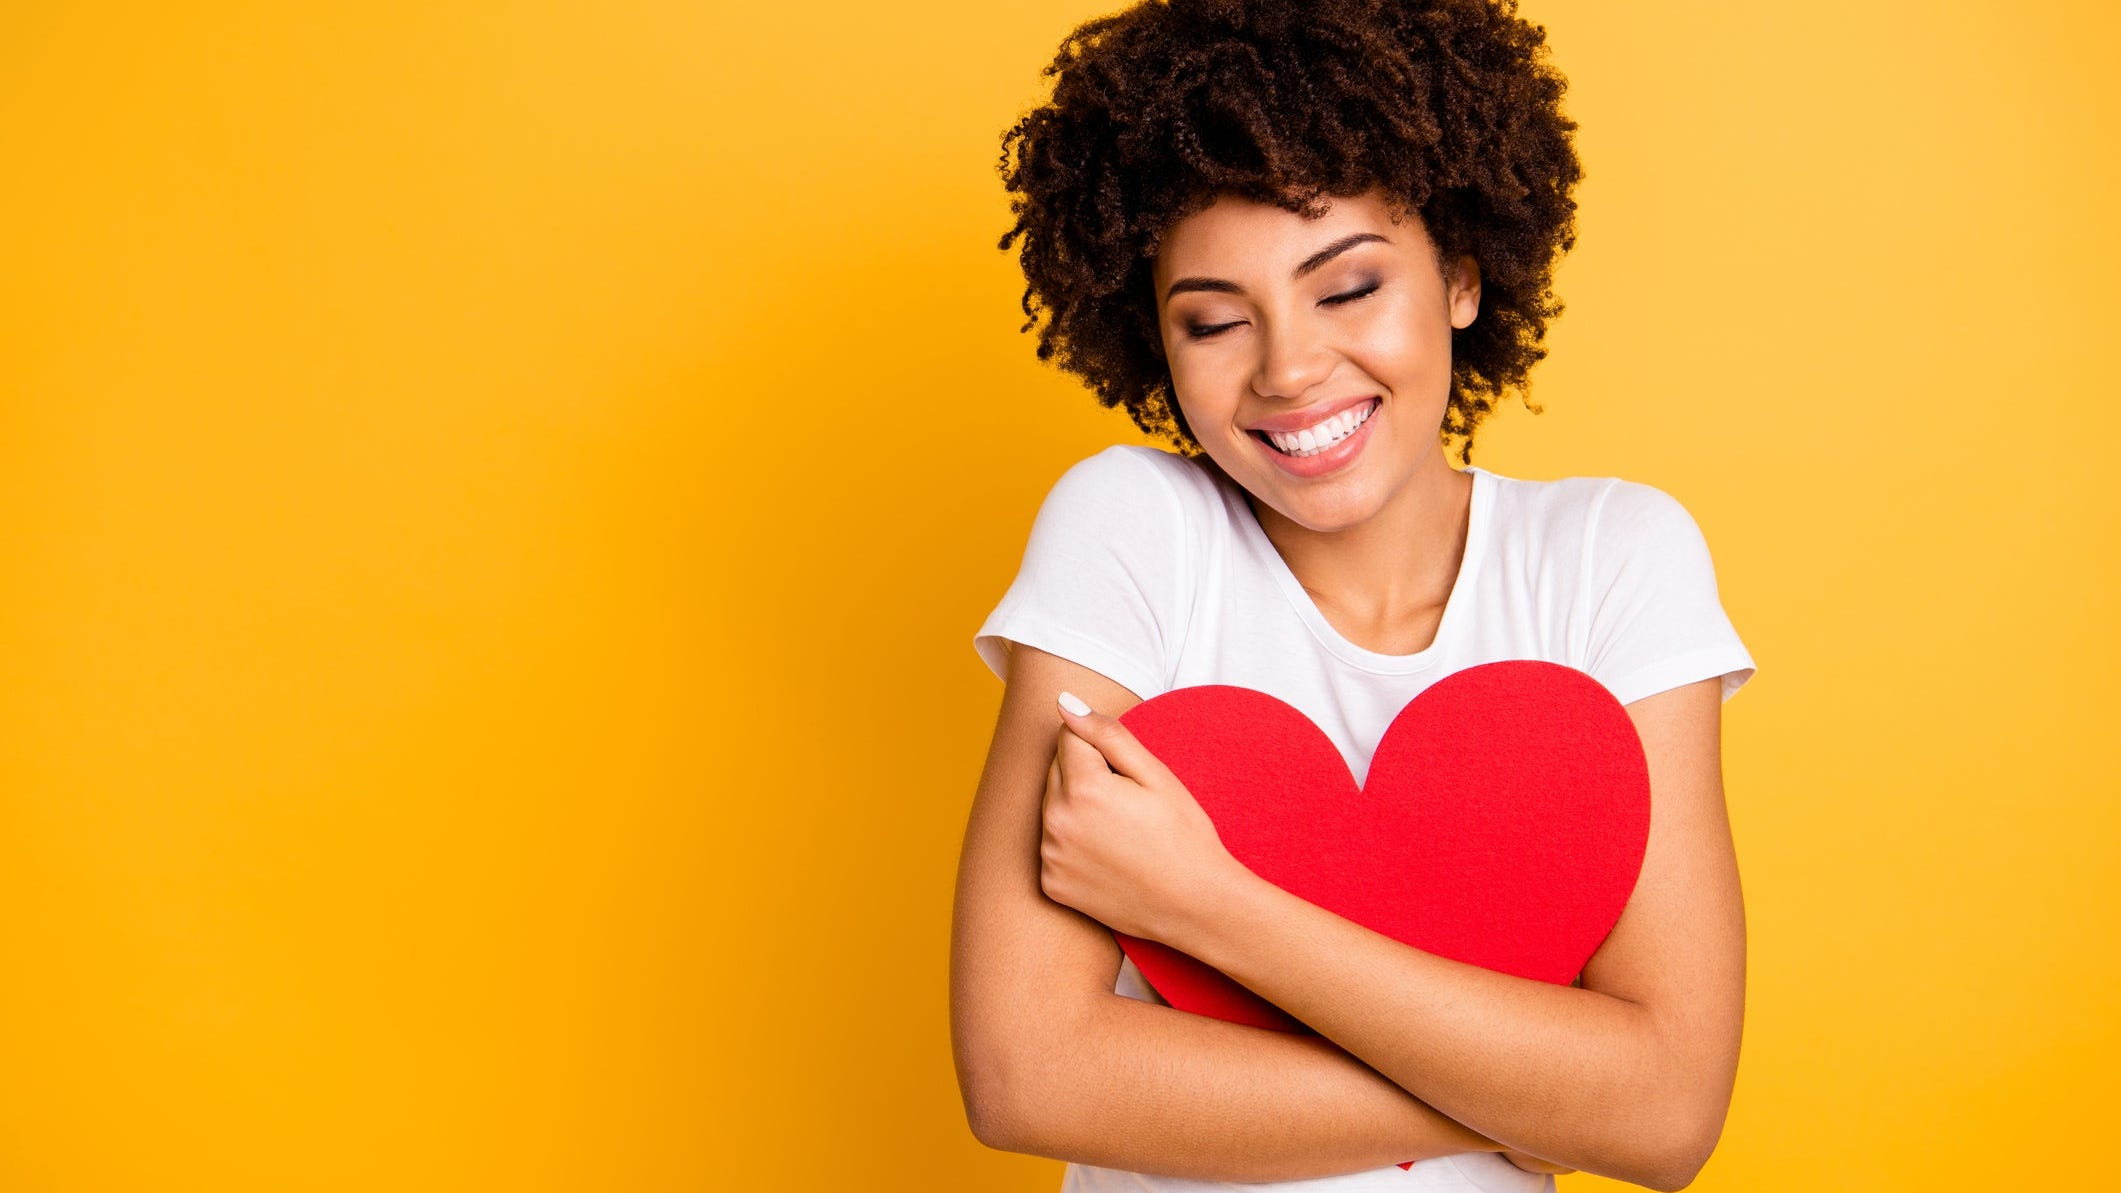 National Hugging Day: 6 safe, feel-good hug alternatives amid the coronavirus pandemic